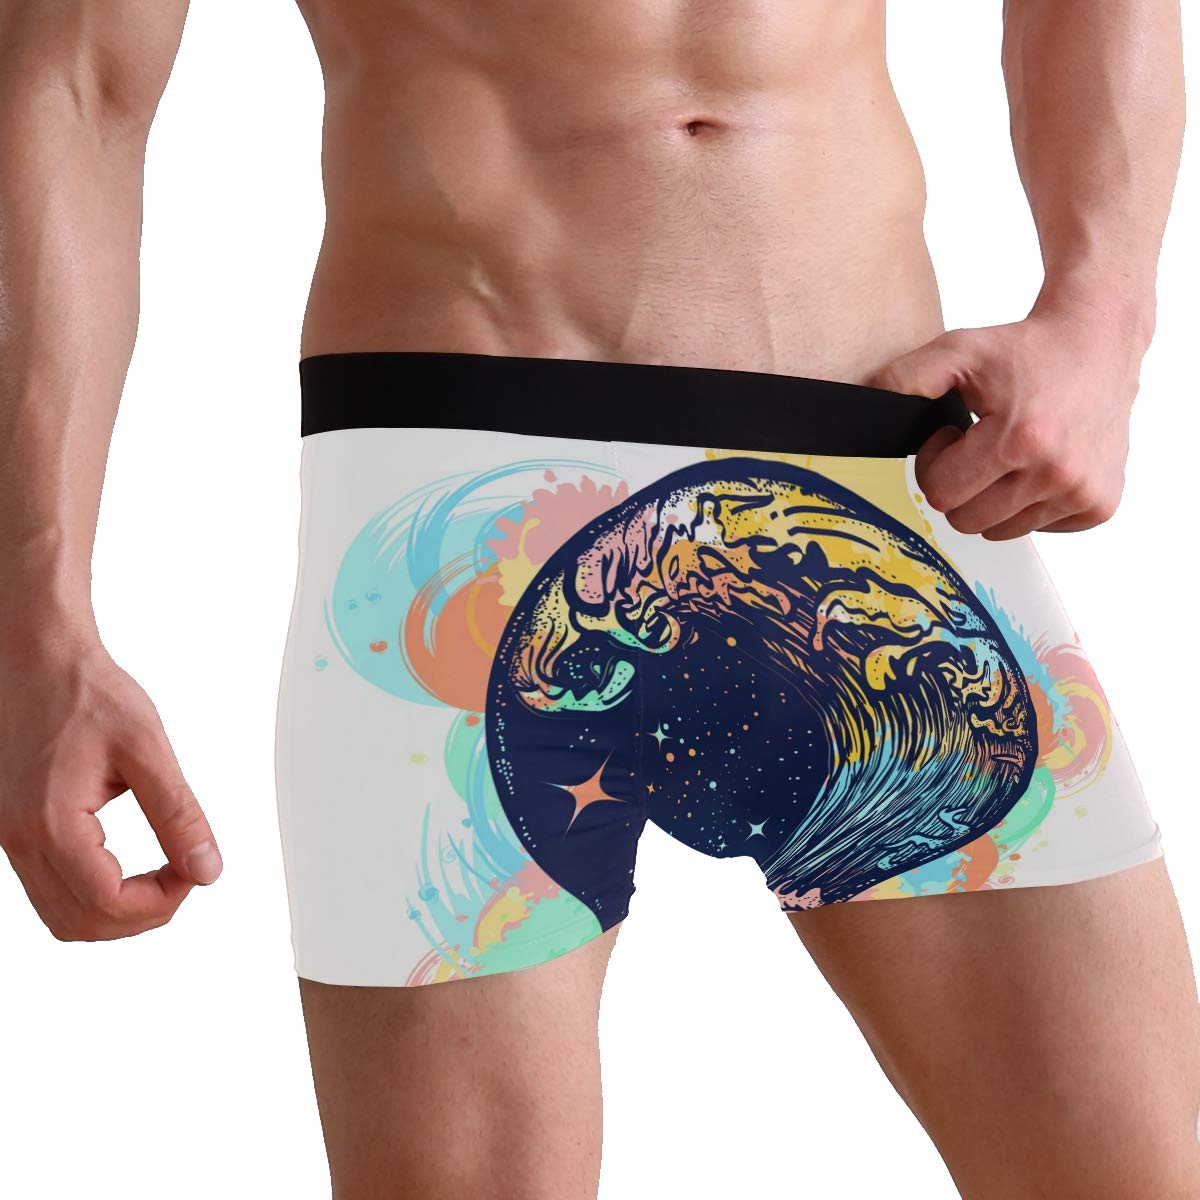 HULKBIDBV Mens underwearStorm Light Bulb Color Tattoo Polyester